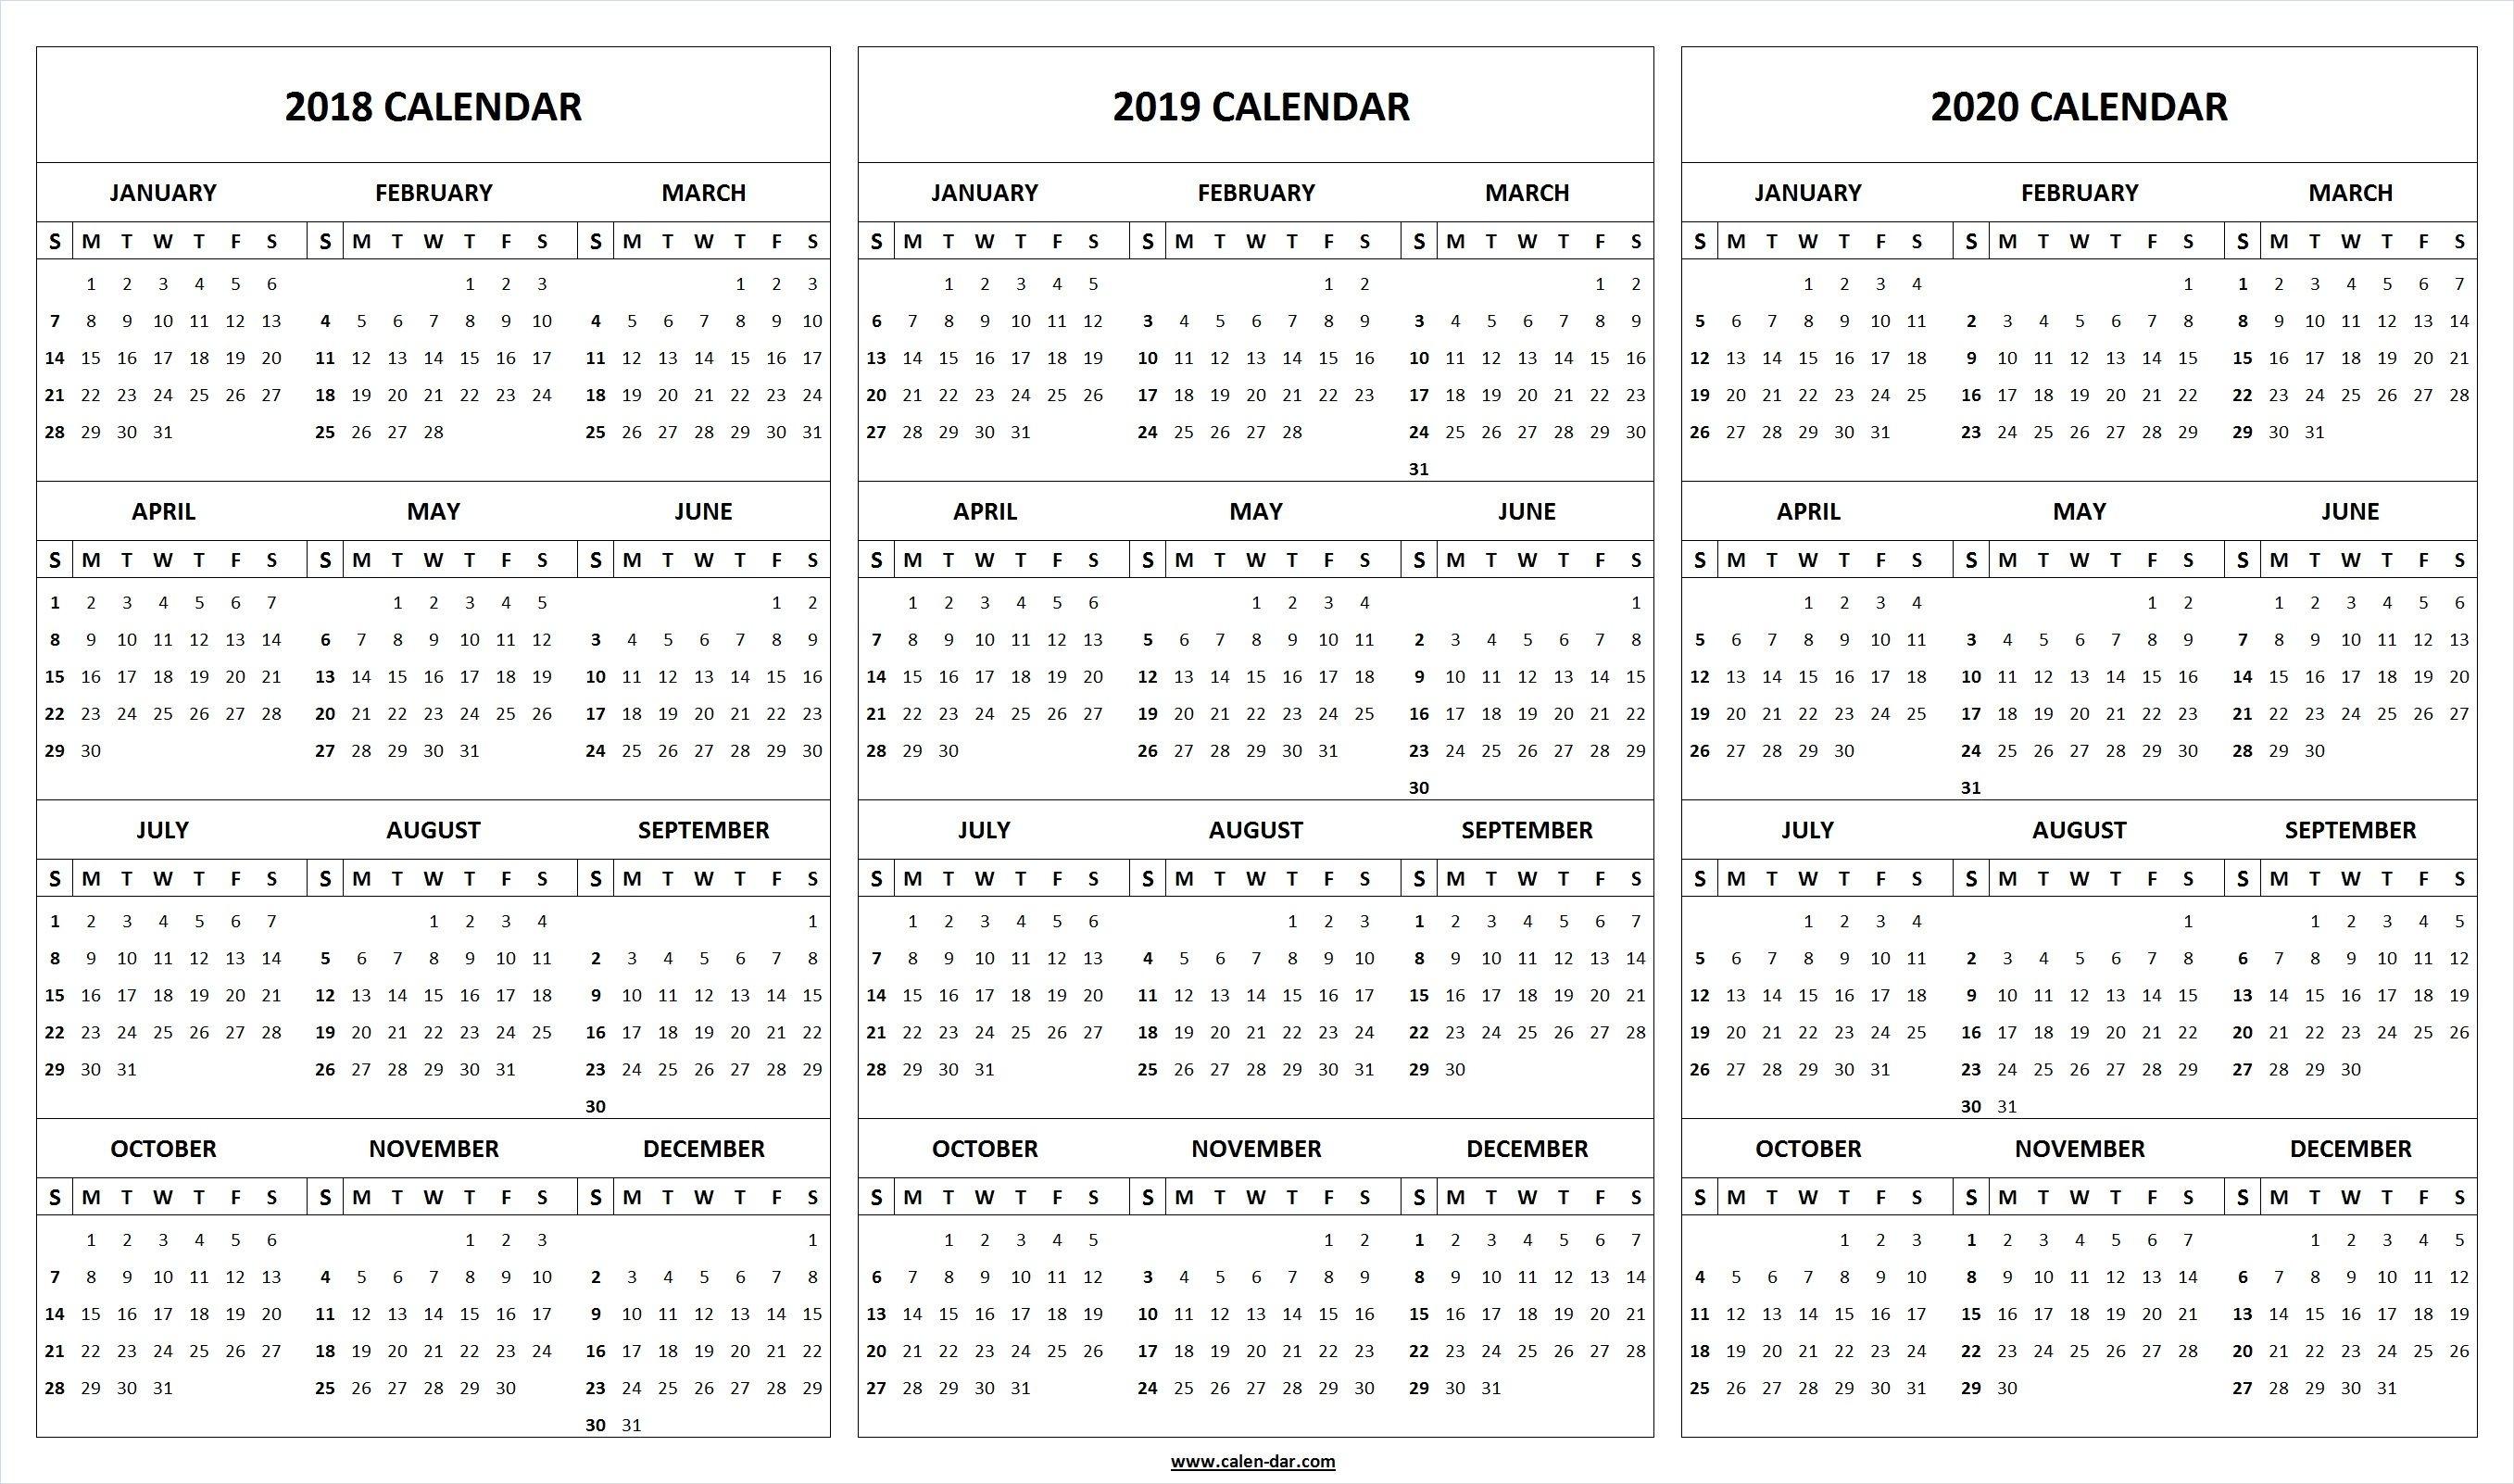 Print Blank 2018 2019 2020 Calendar Template | Organize! | Printable for School Year At A Glance Calendar 2019-2020